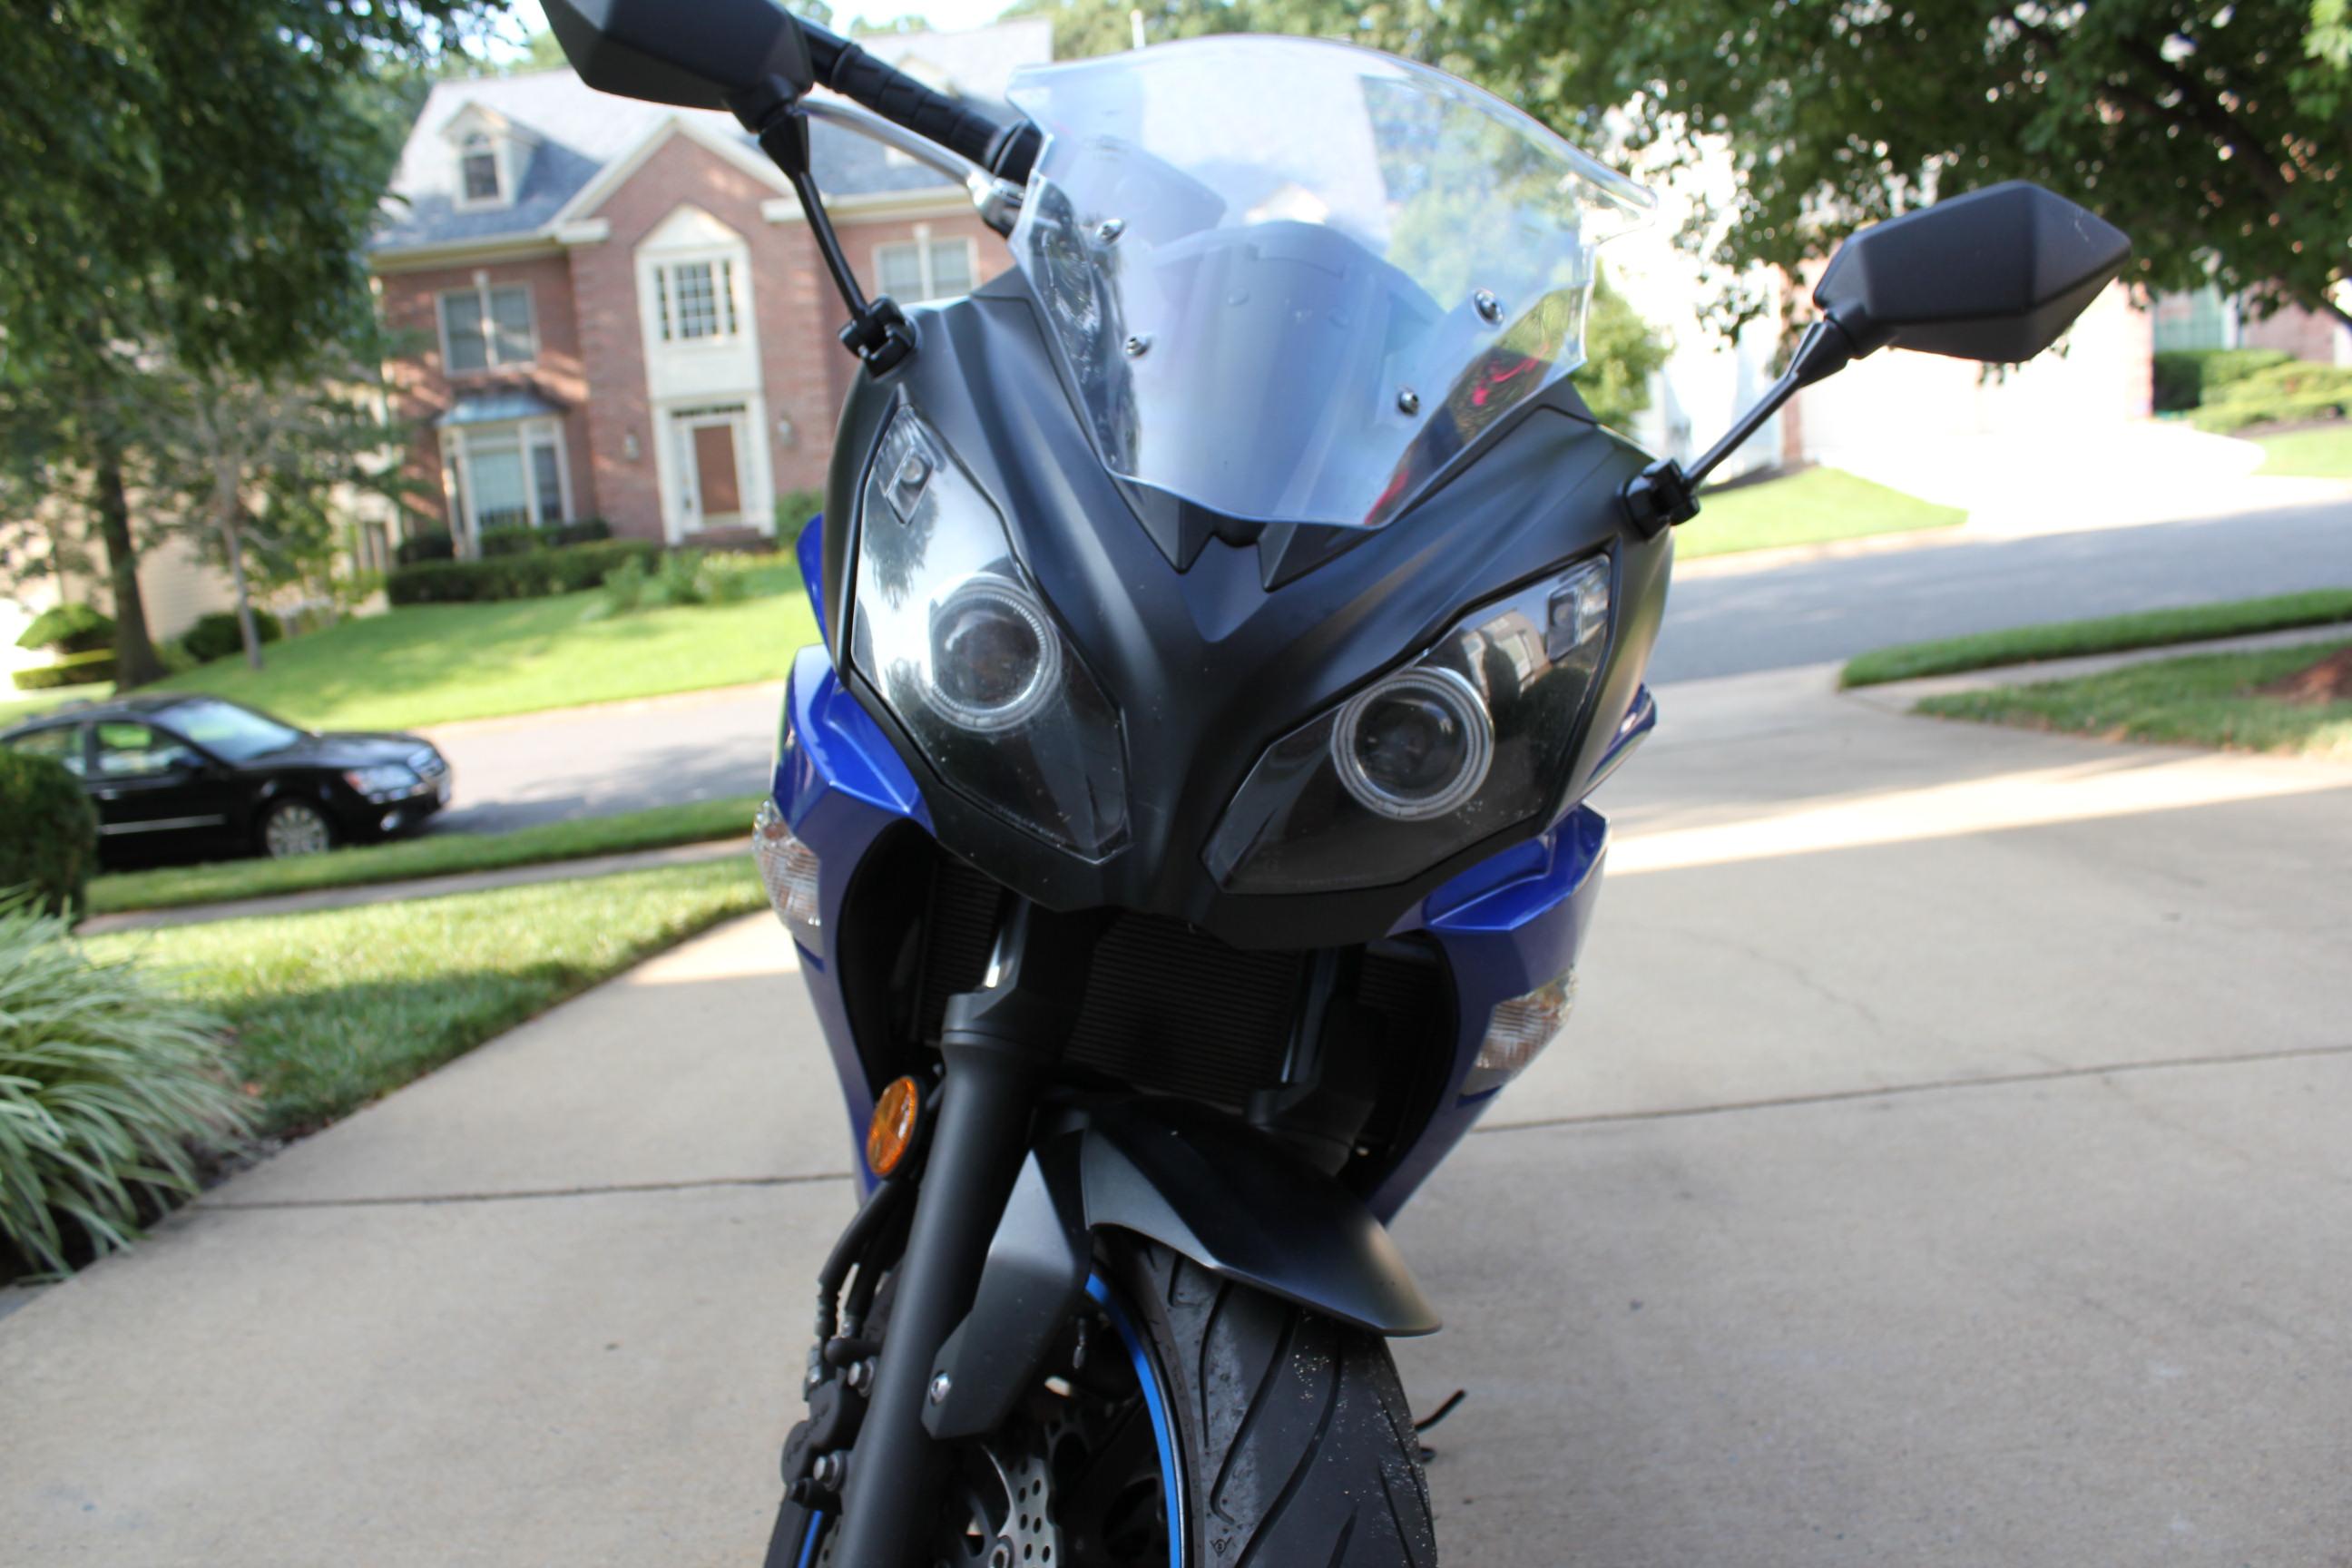 2013 ninja 650 headlight assemby with hid retrofit